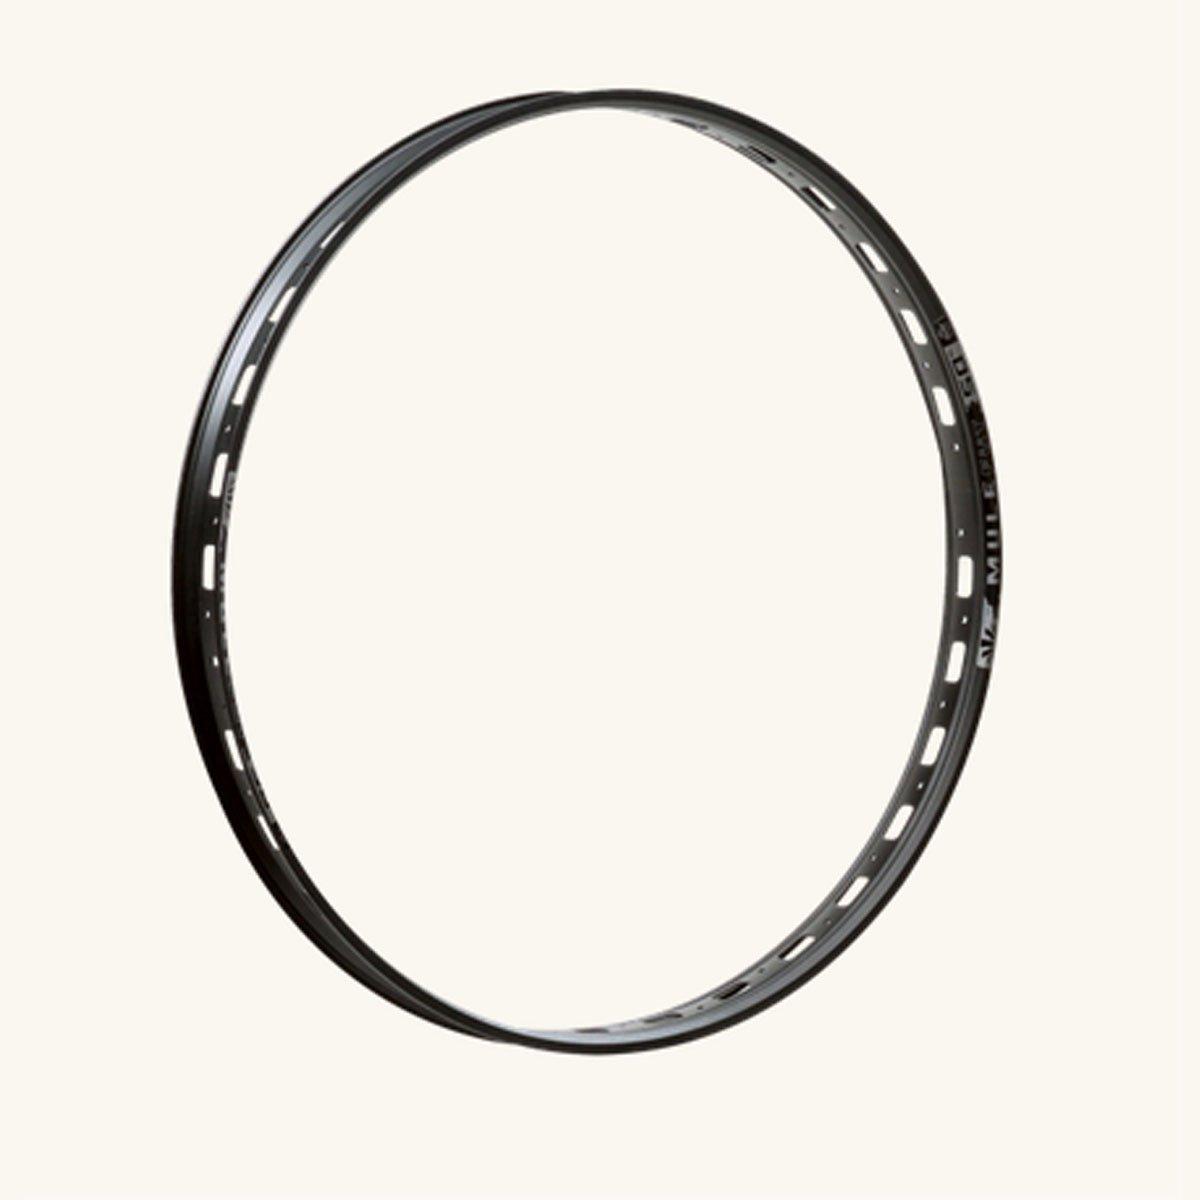 Felge Sun Ringle mulefut 50 SL 27,5 32P schwarz